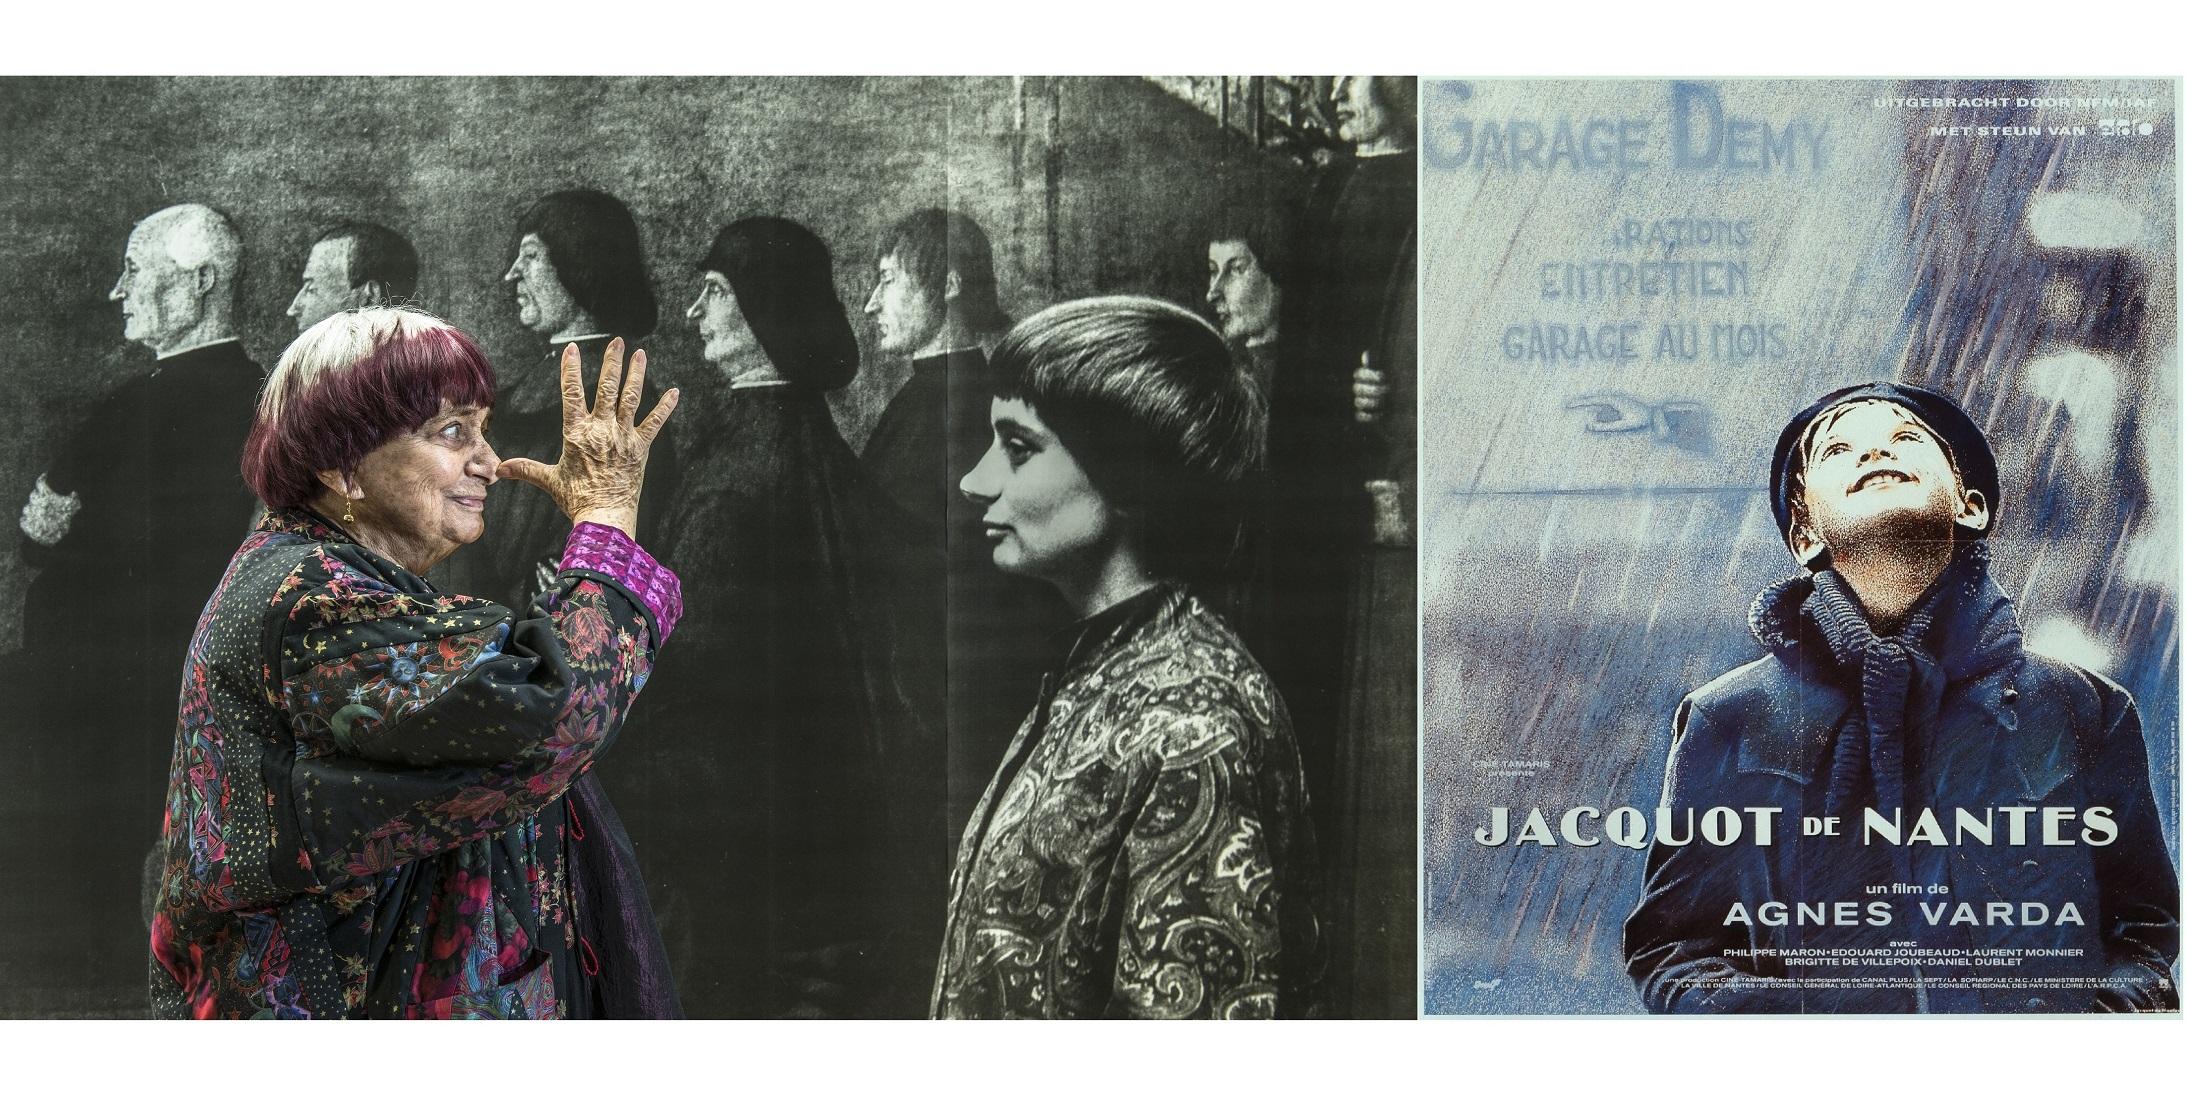 Special screening as a tribute to Agnès Varda – 13th